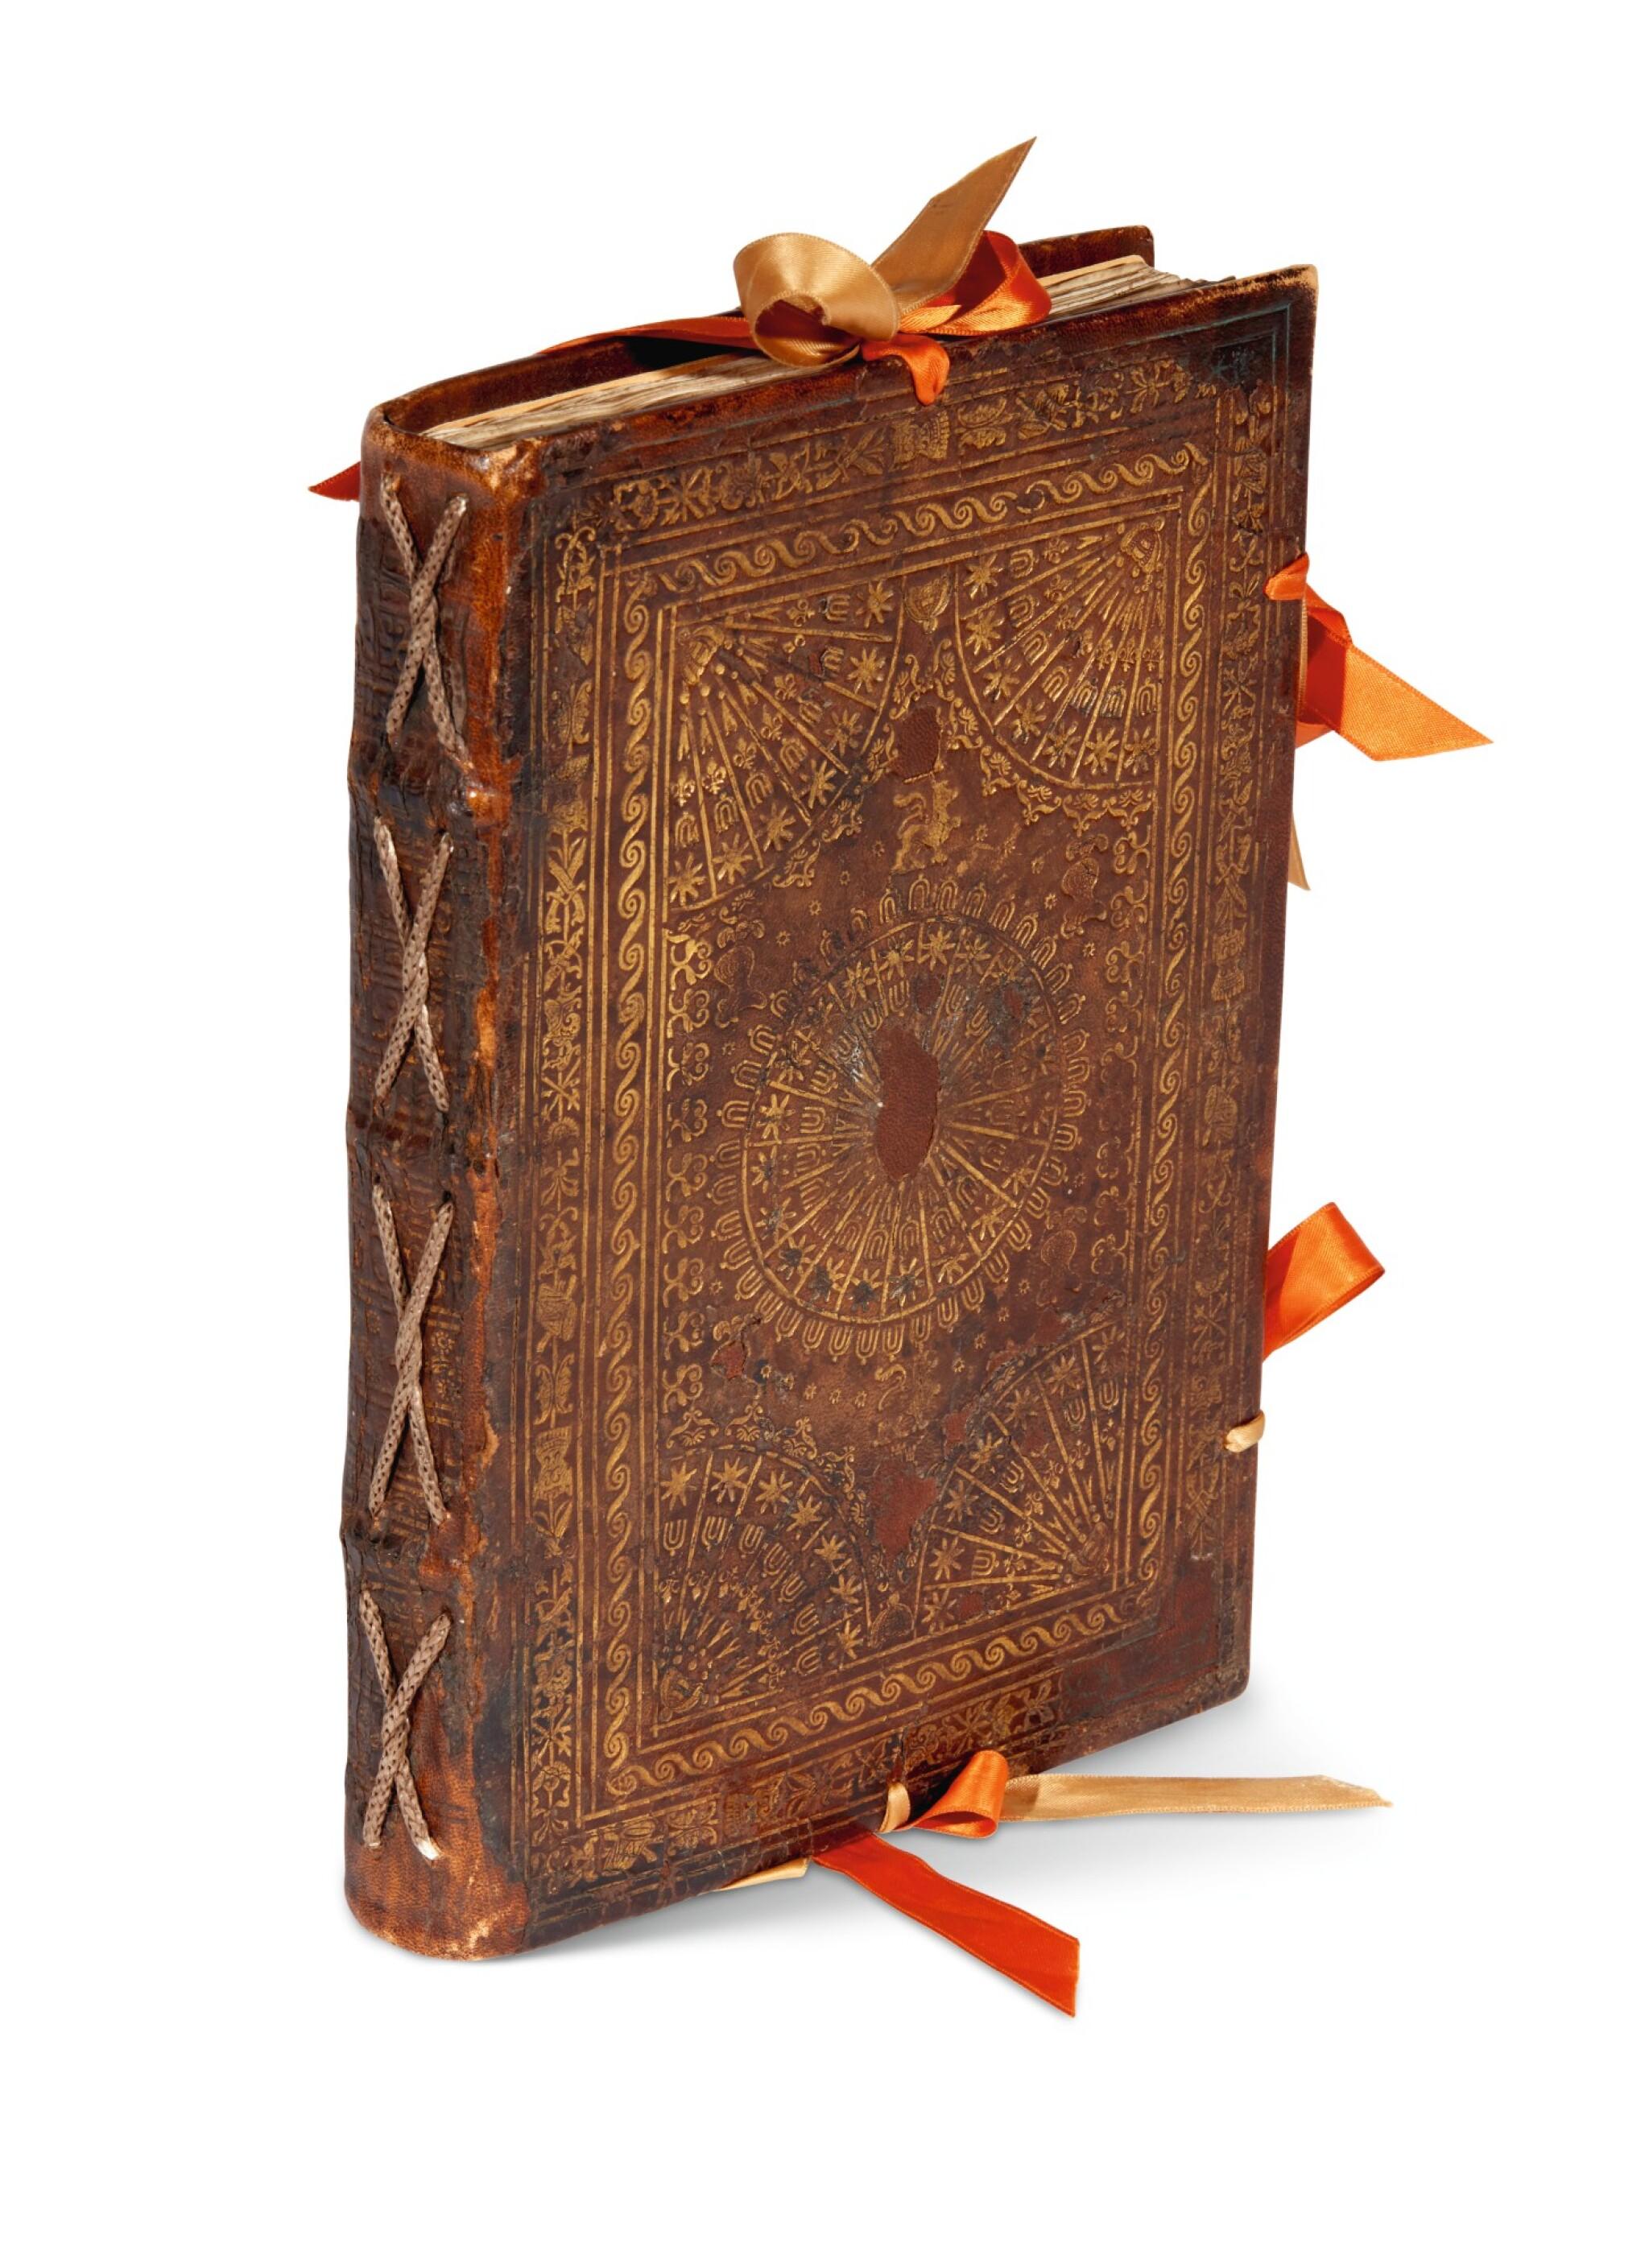 Carta executoria de hidalguía, Valladolid, 16 December 1636, manuscript on vellum, contemporary calf gilt